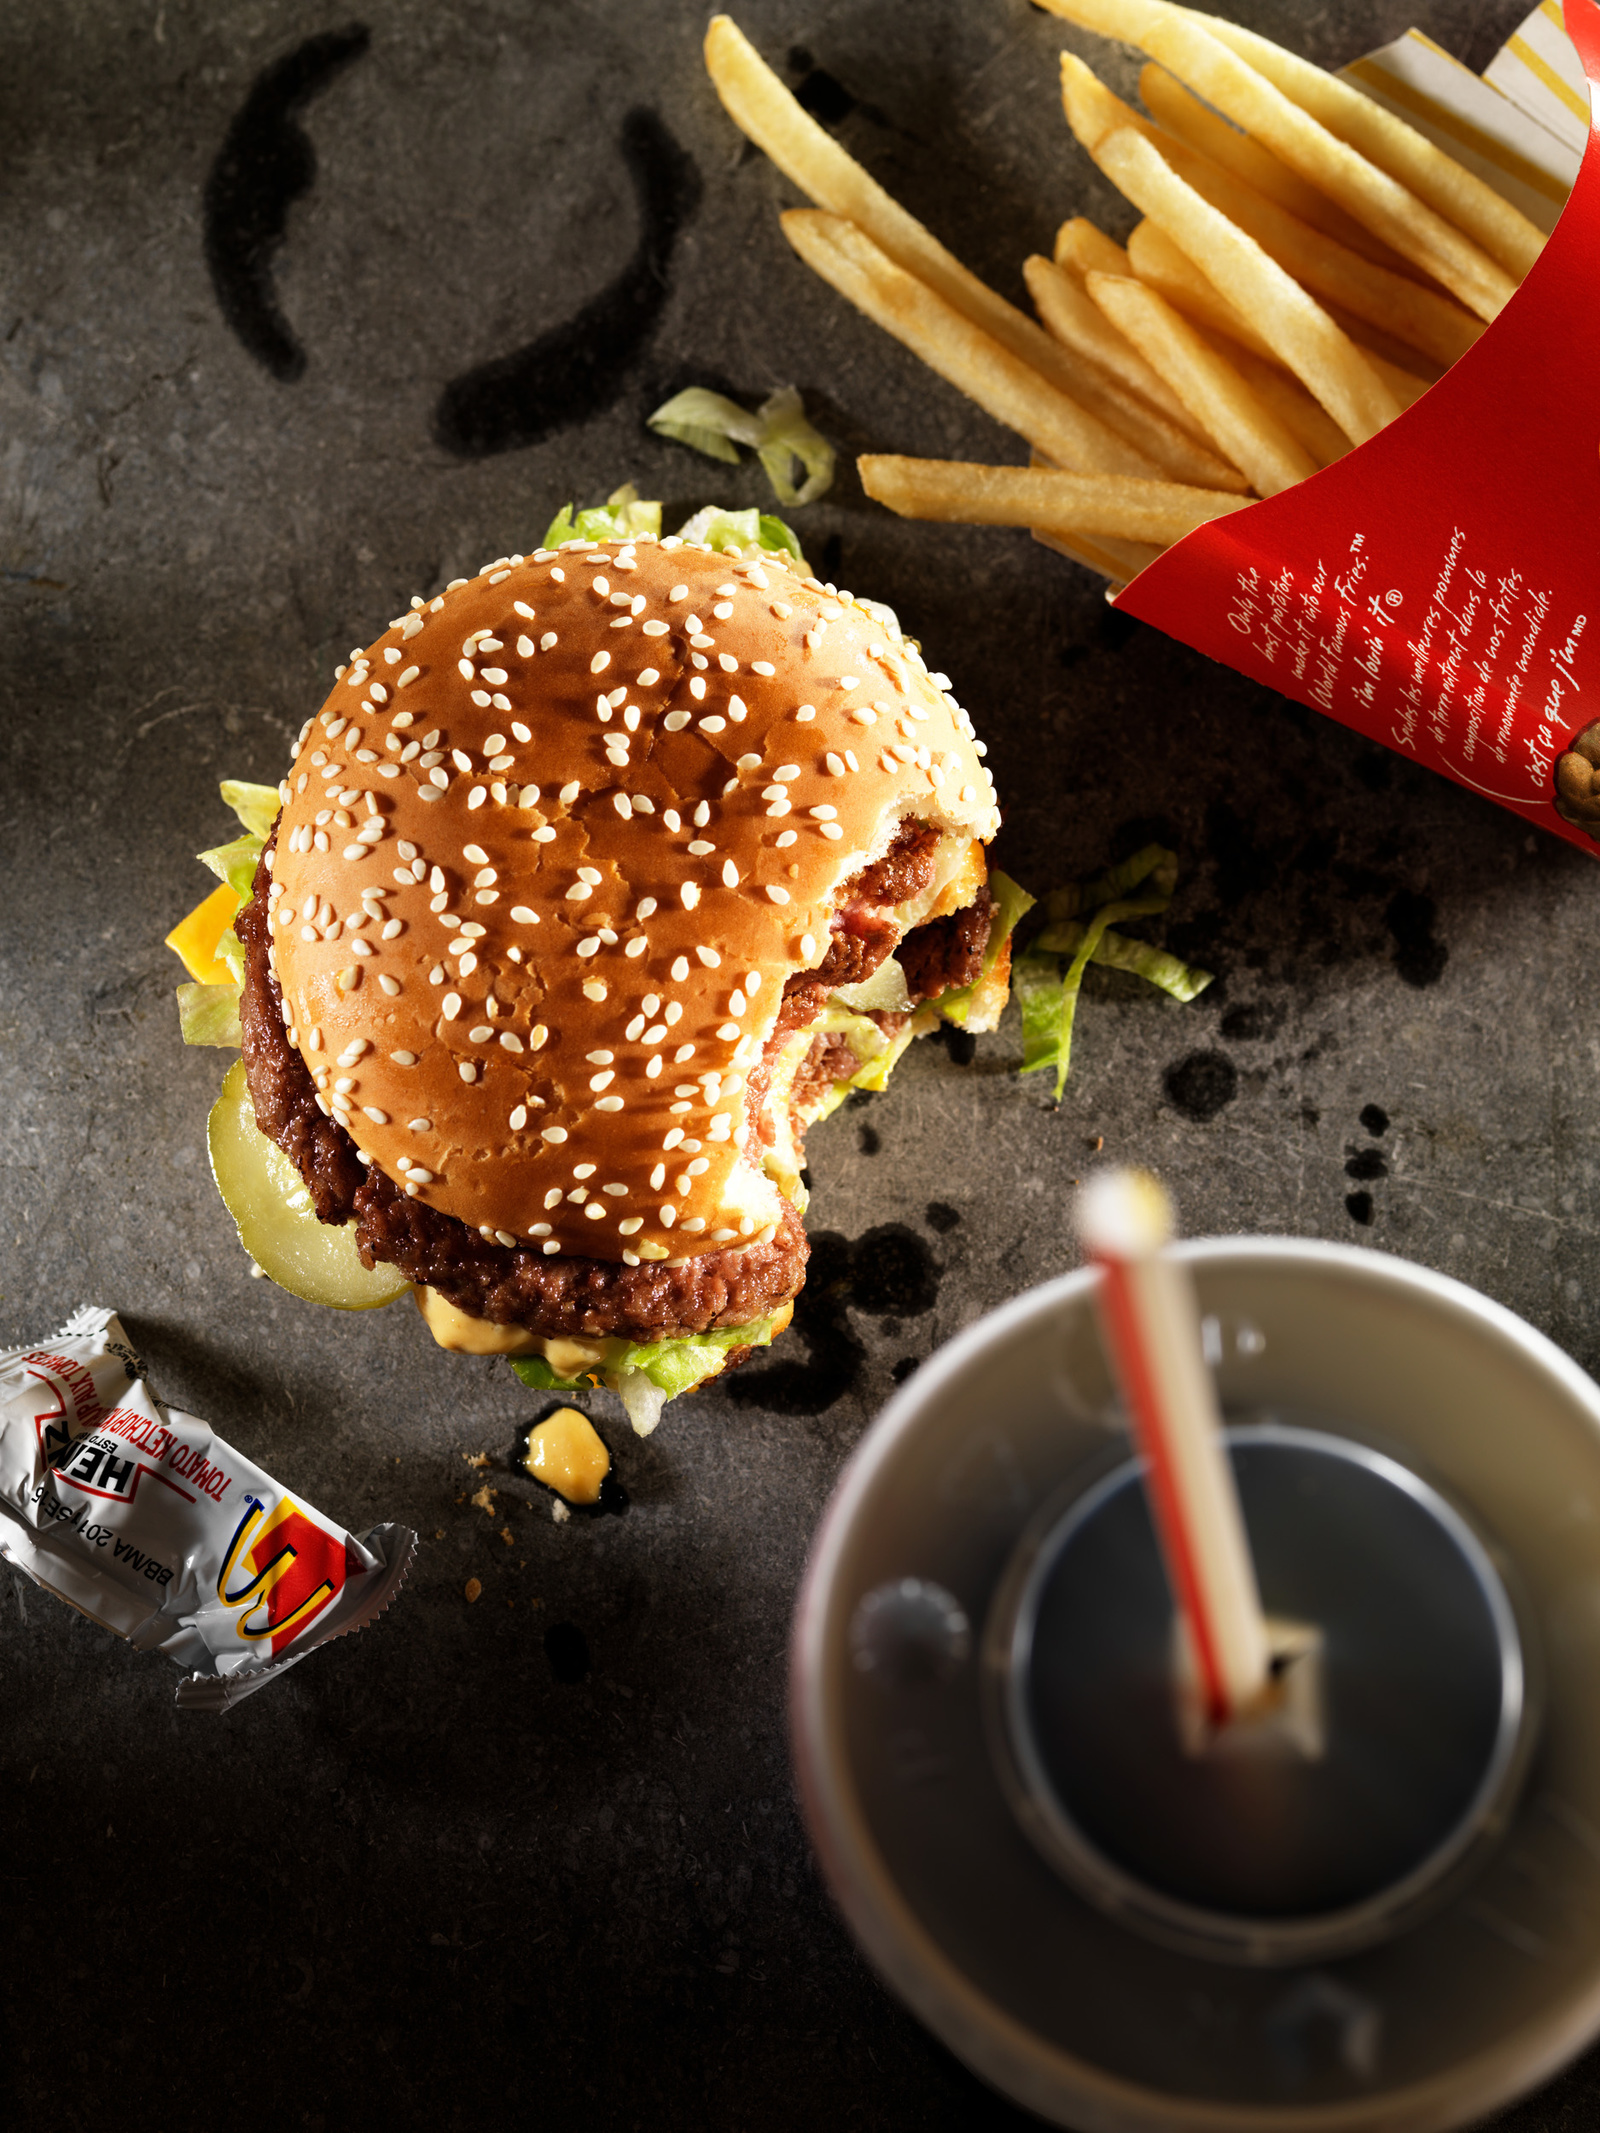 218807-10896498-McDonald_Selects_0001_jpg.jpg